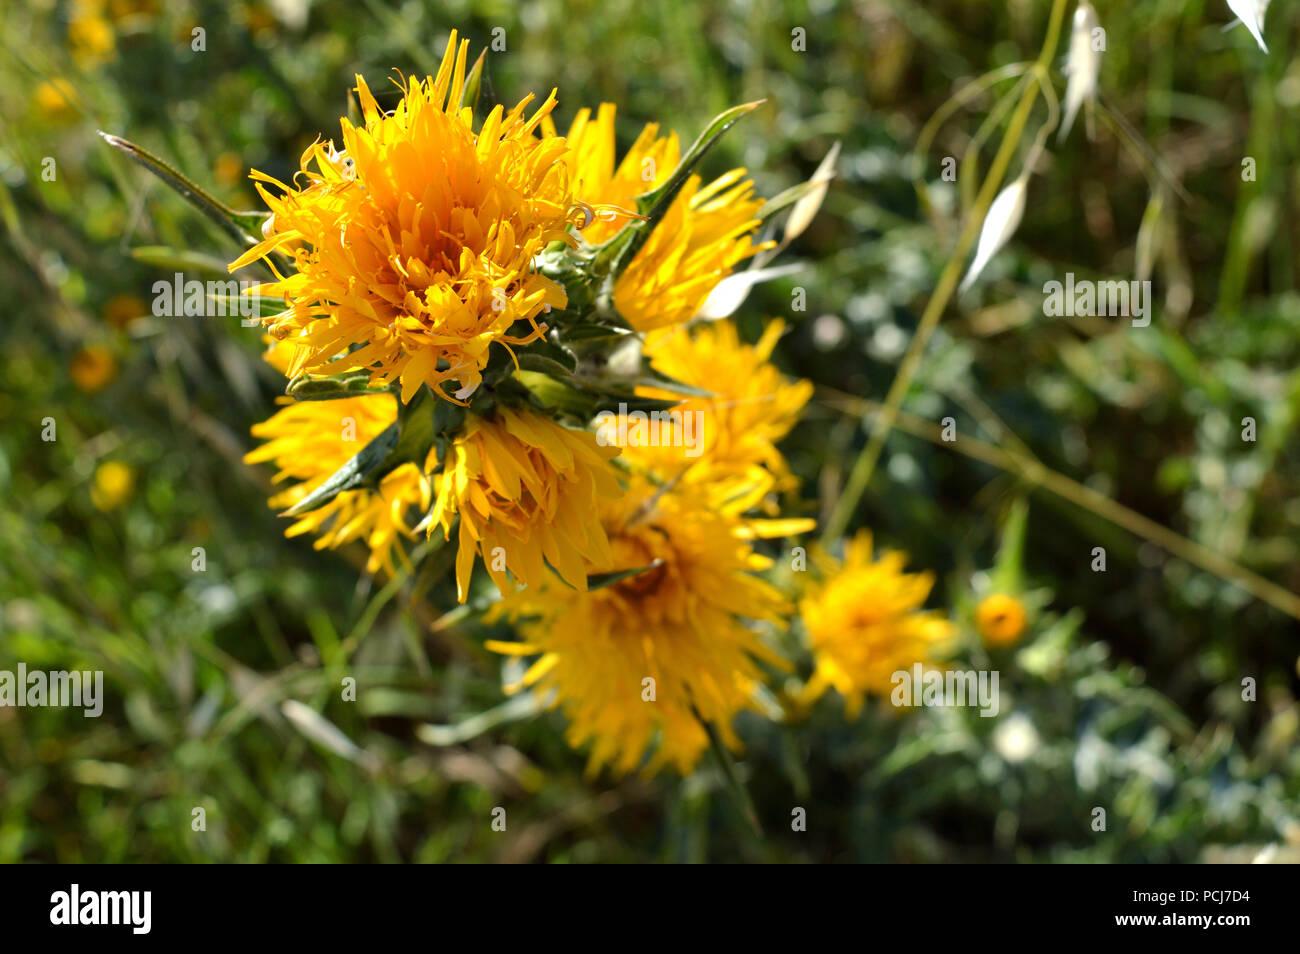 Close-up of Wild Yellow Thistles Flowering, Nature, Macro, Sicily - Stock Image